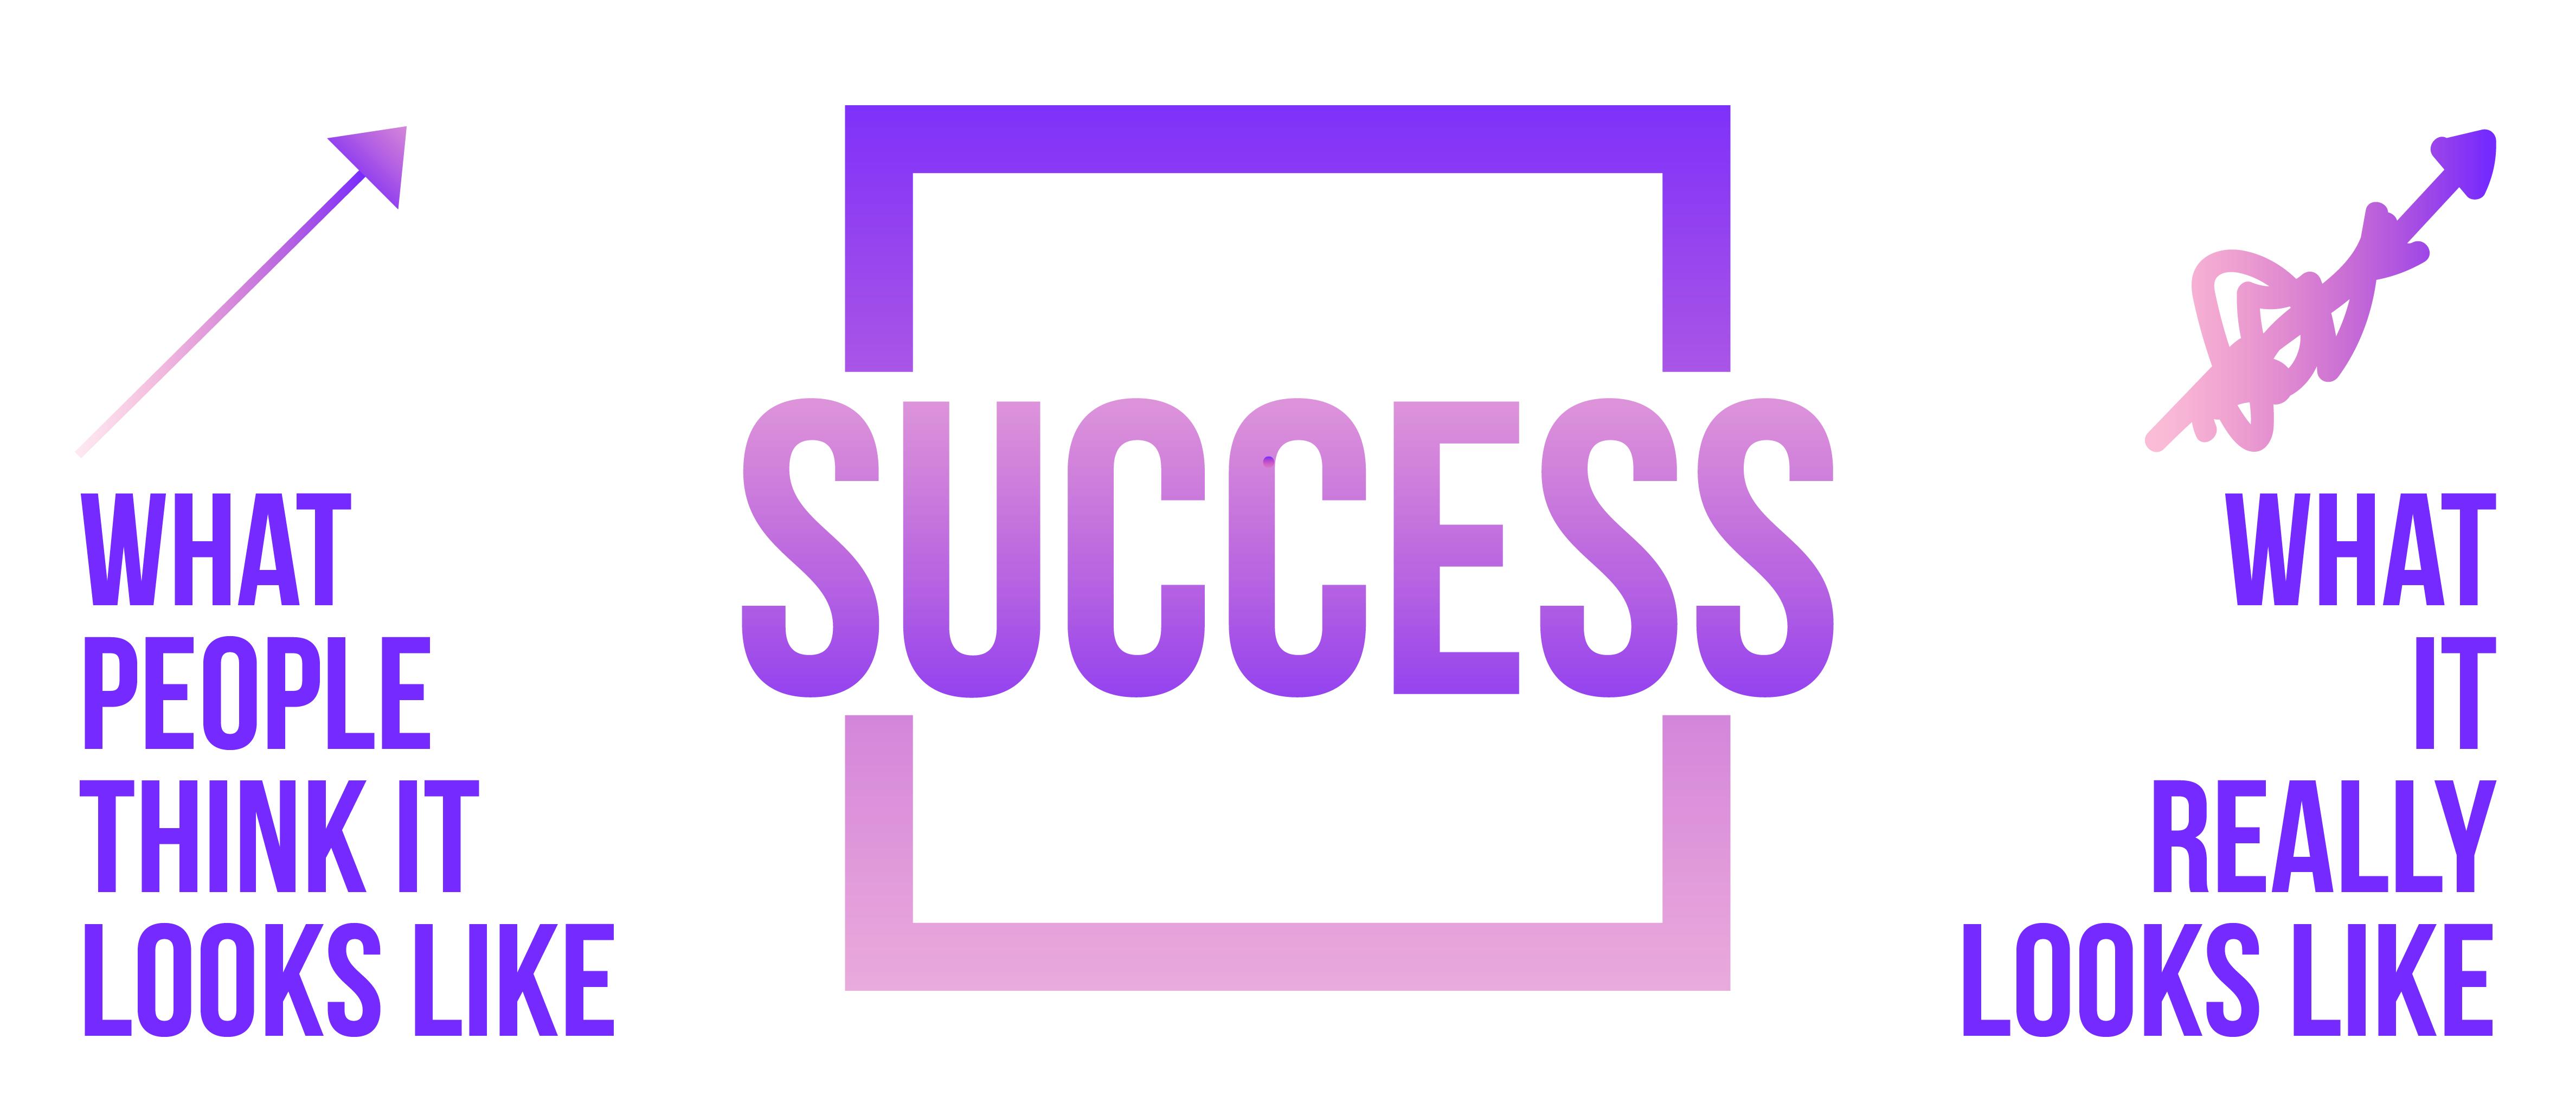 Overnight Success is Bullshit!